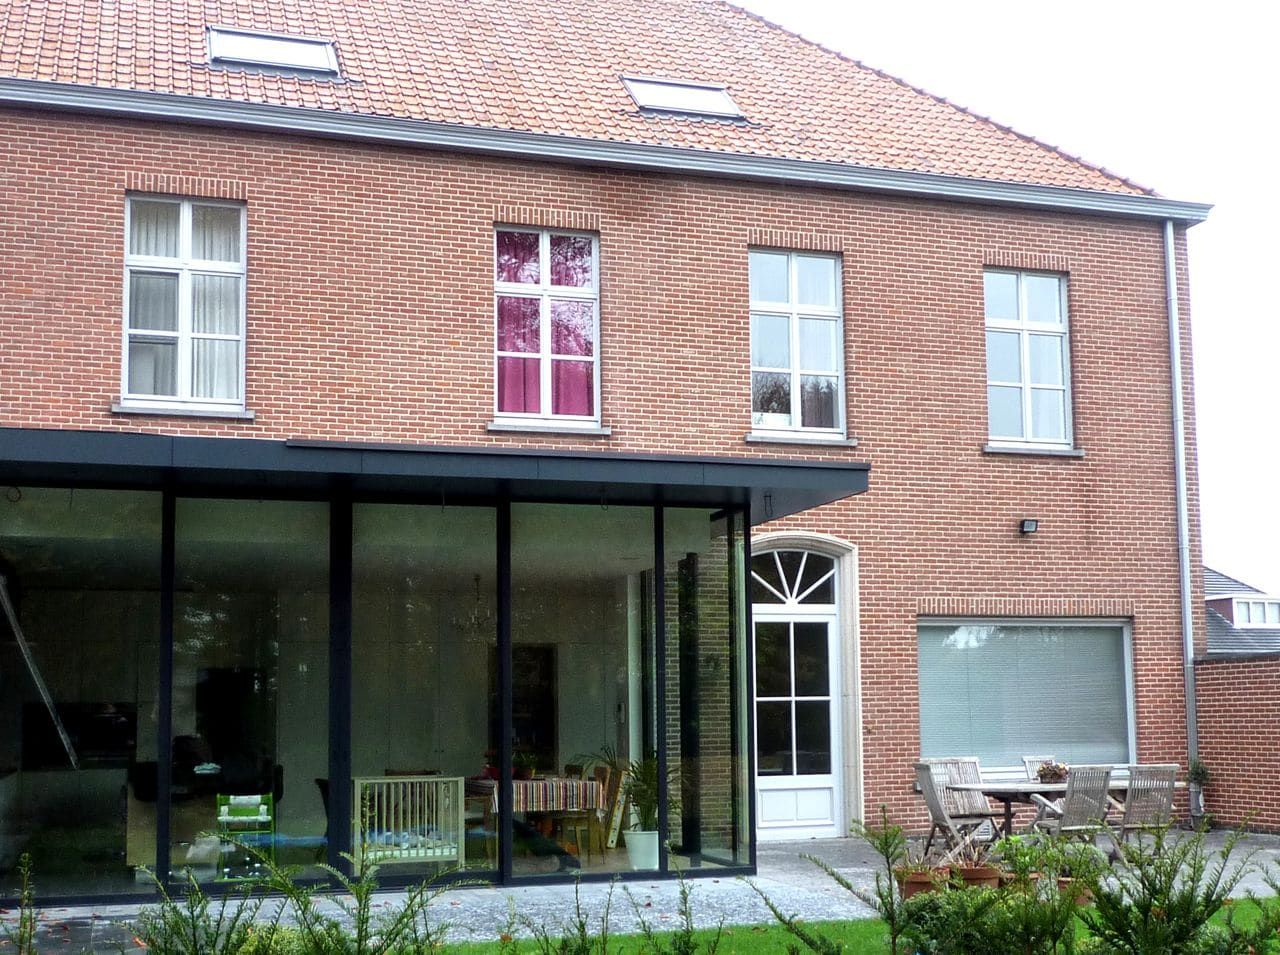 P1100358 | Baeyens & Beck architecten Gent | architect nieuwbouw renovatie interieur | high end | architectenbureau